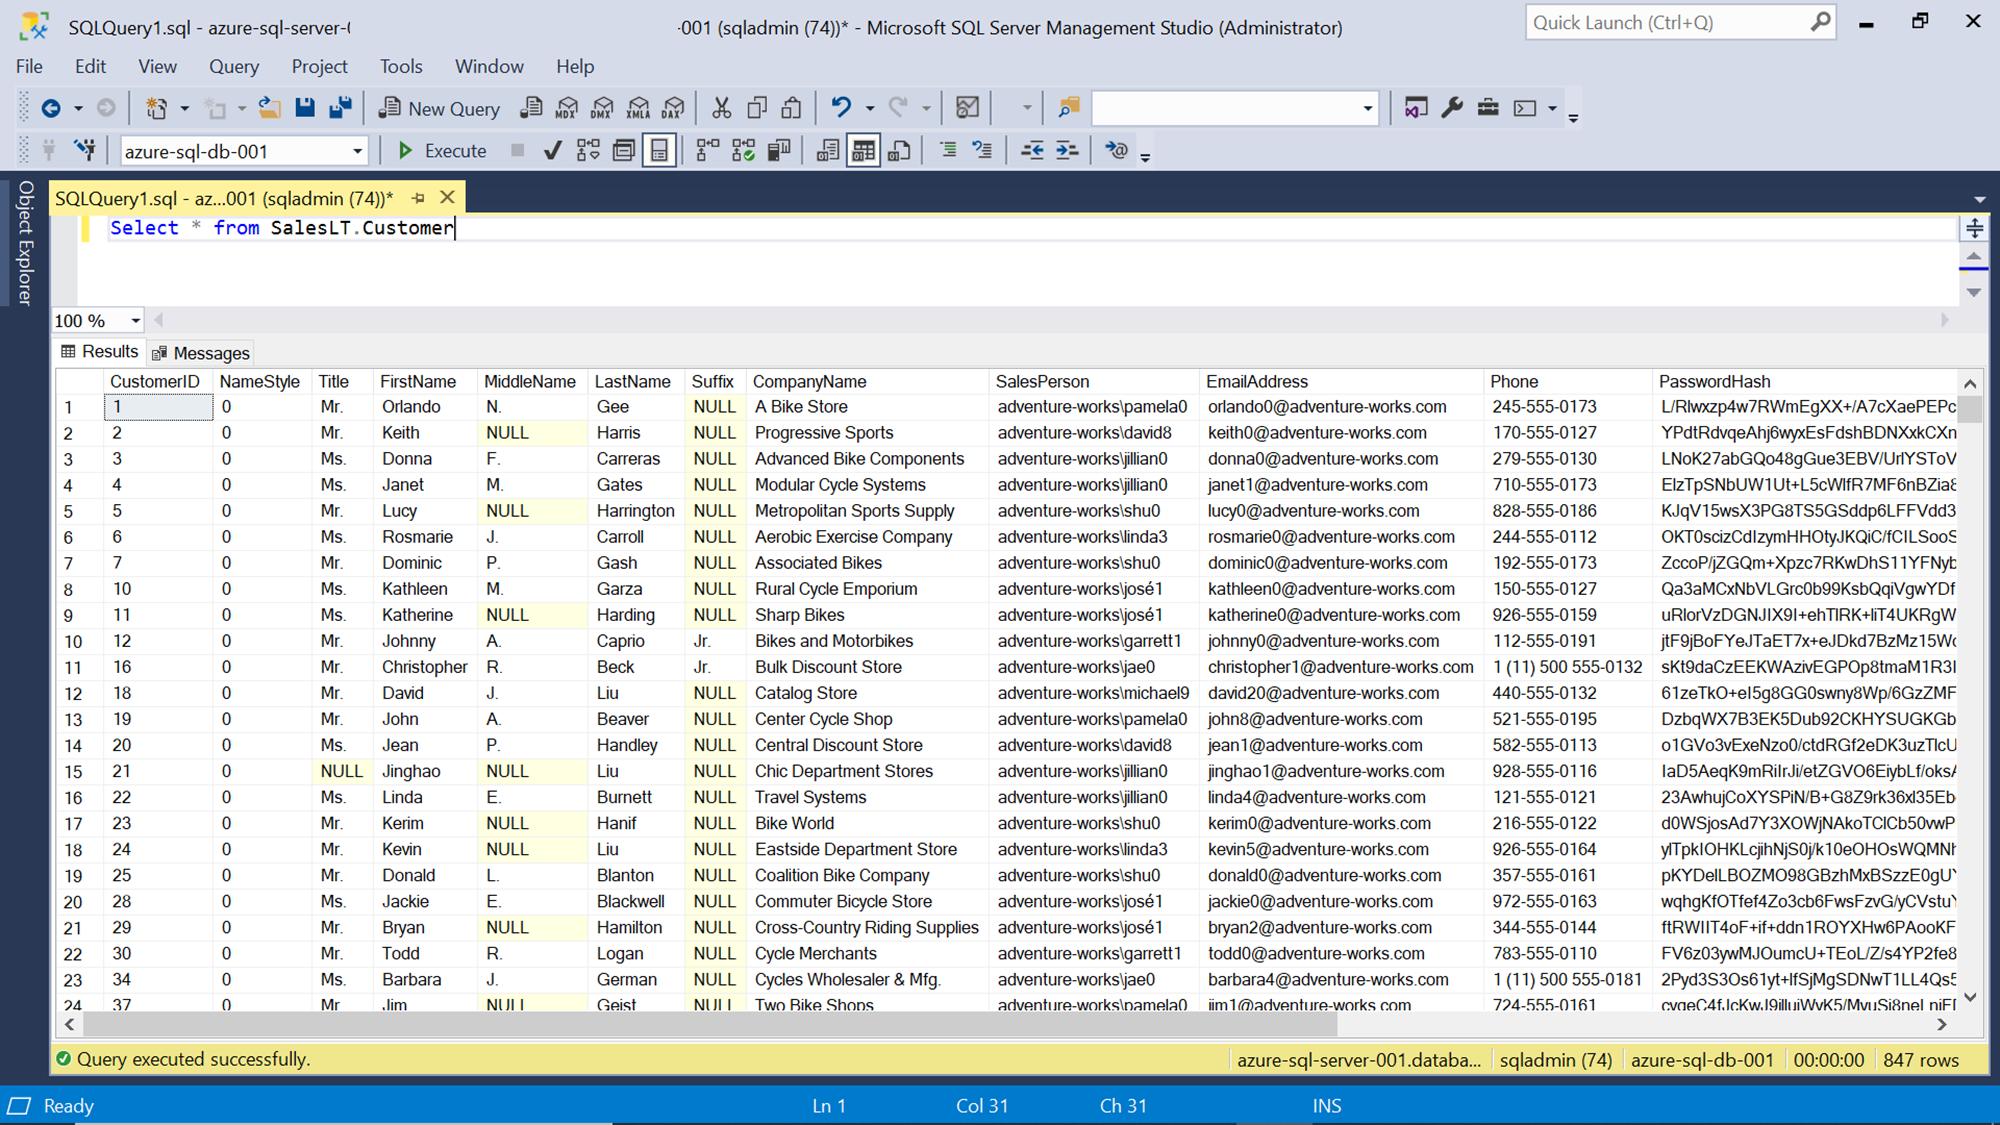 Azure SQL Server Database - SSMS